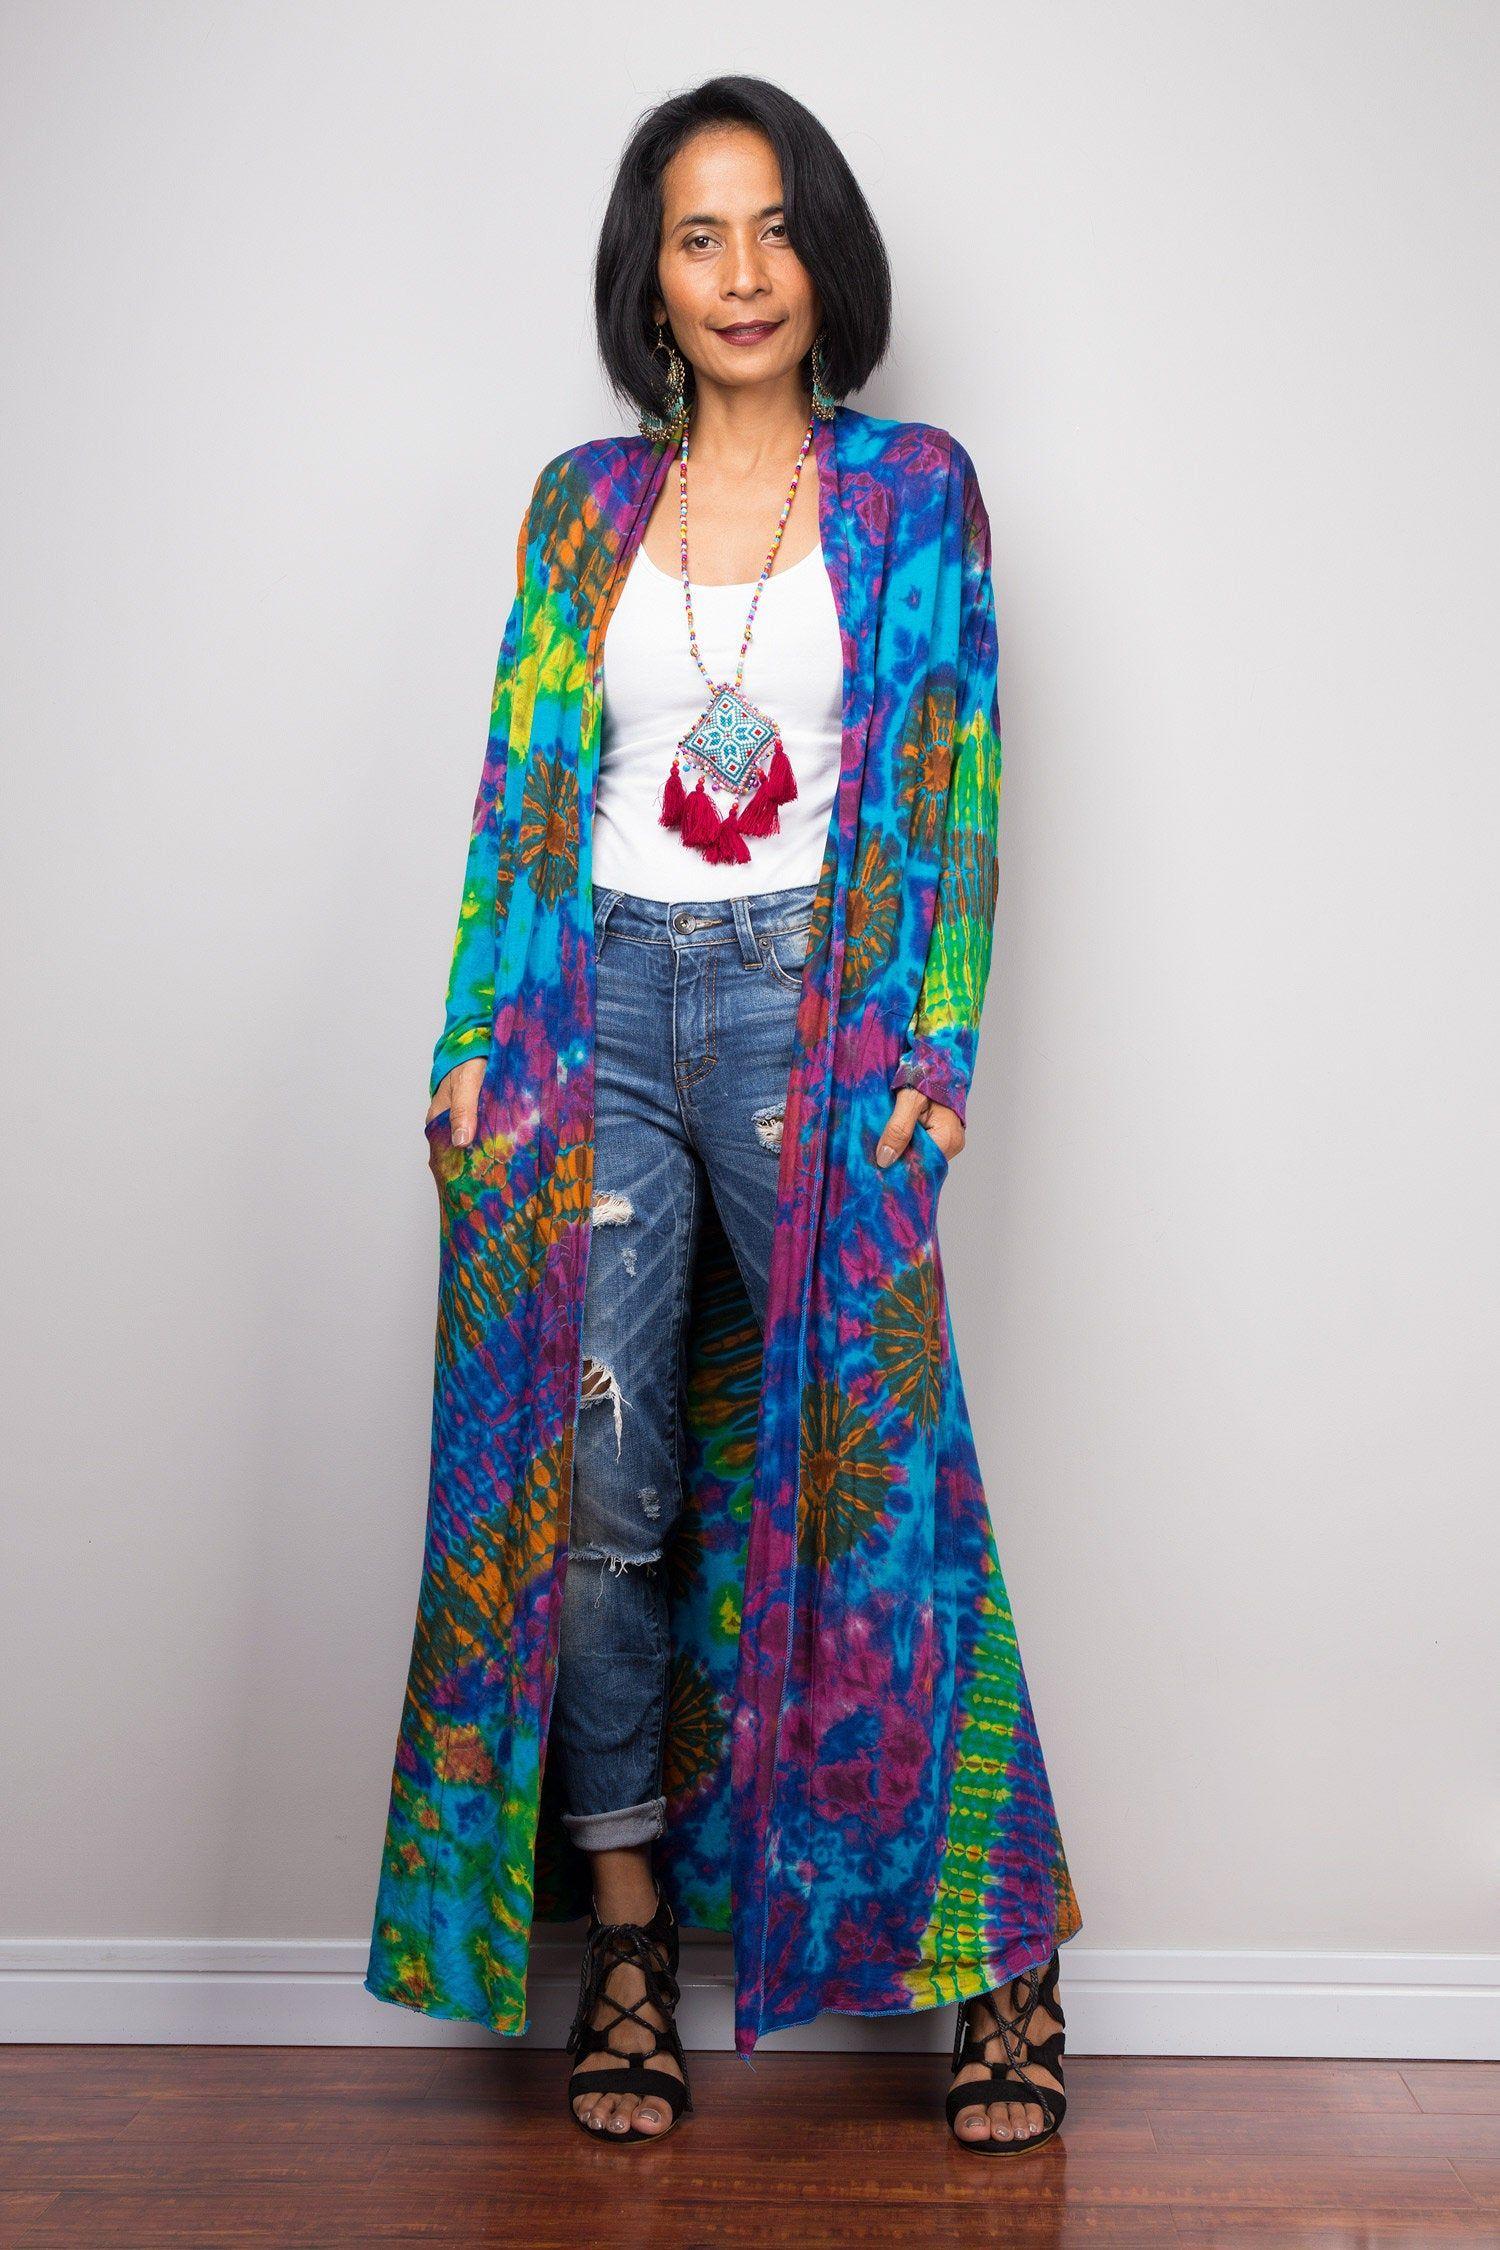 Hippie Rainbow Duster Vest with pockets Festival wear Tie dye robe Beach cover up Tie Dye Cardigan Kimono